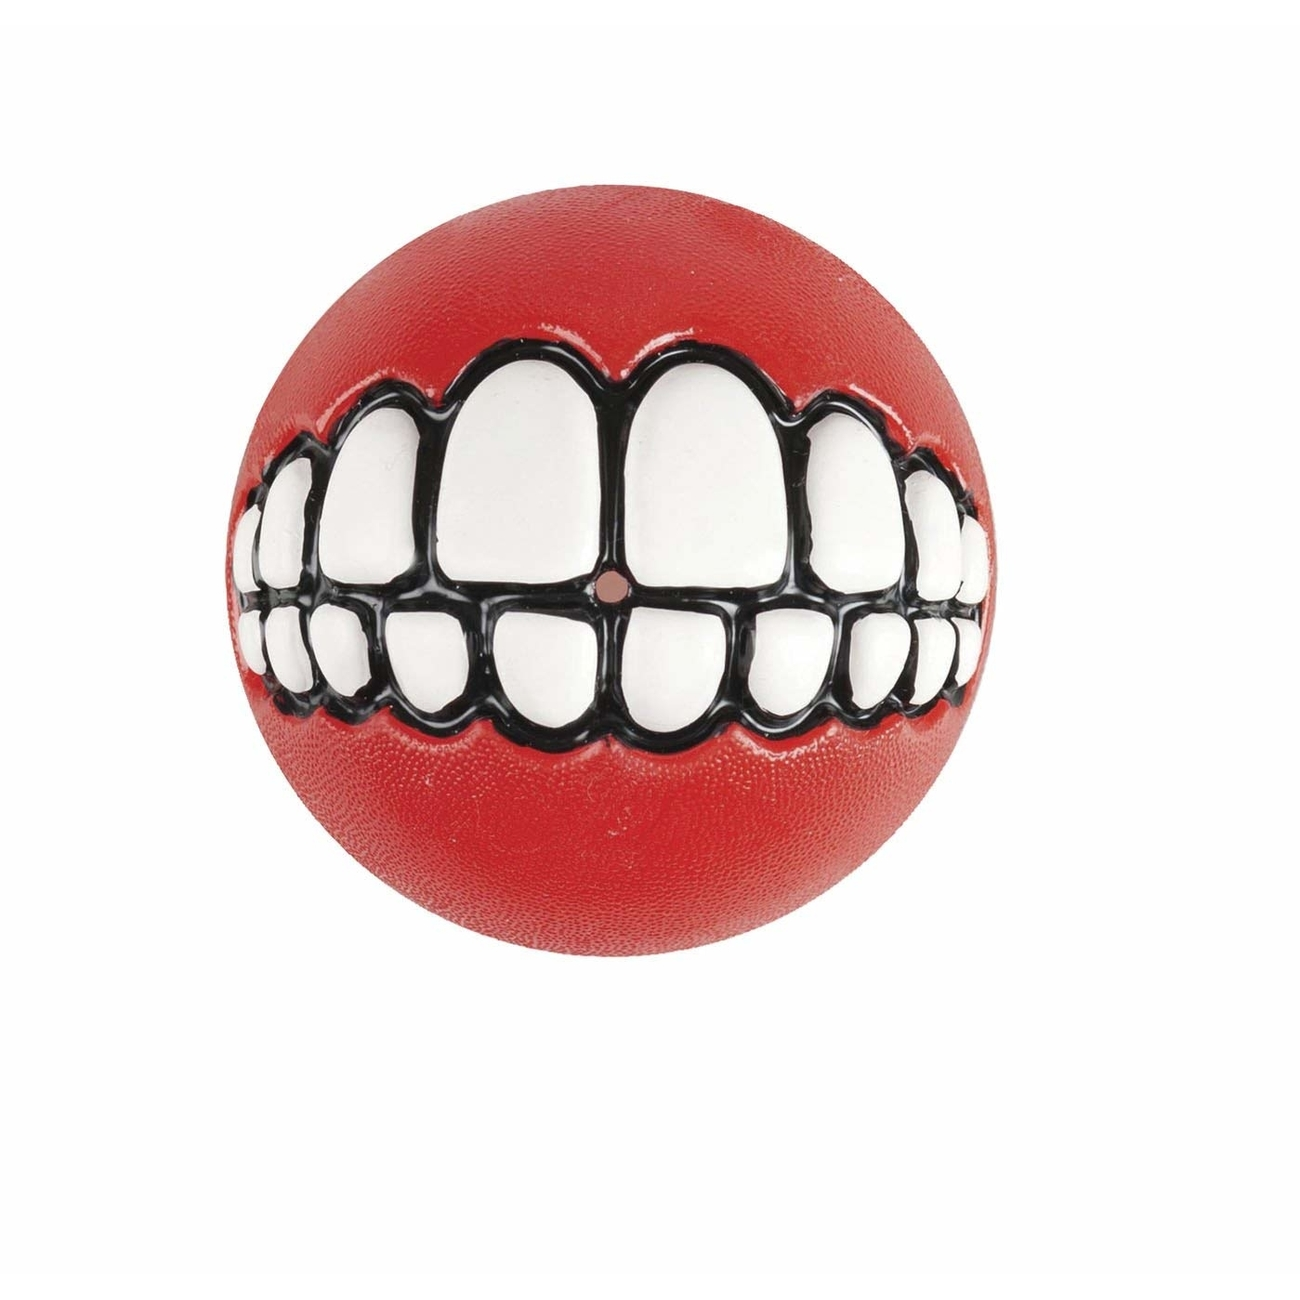 ROGZ Grinz Ball für Hunde, 6,4cm Ø rot